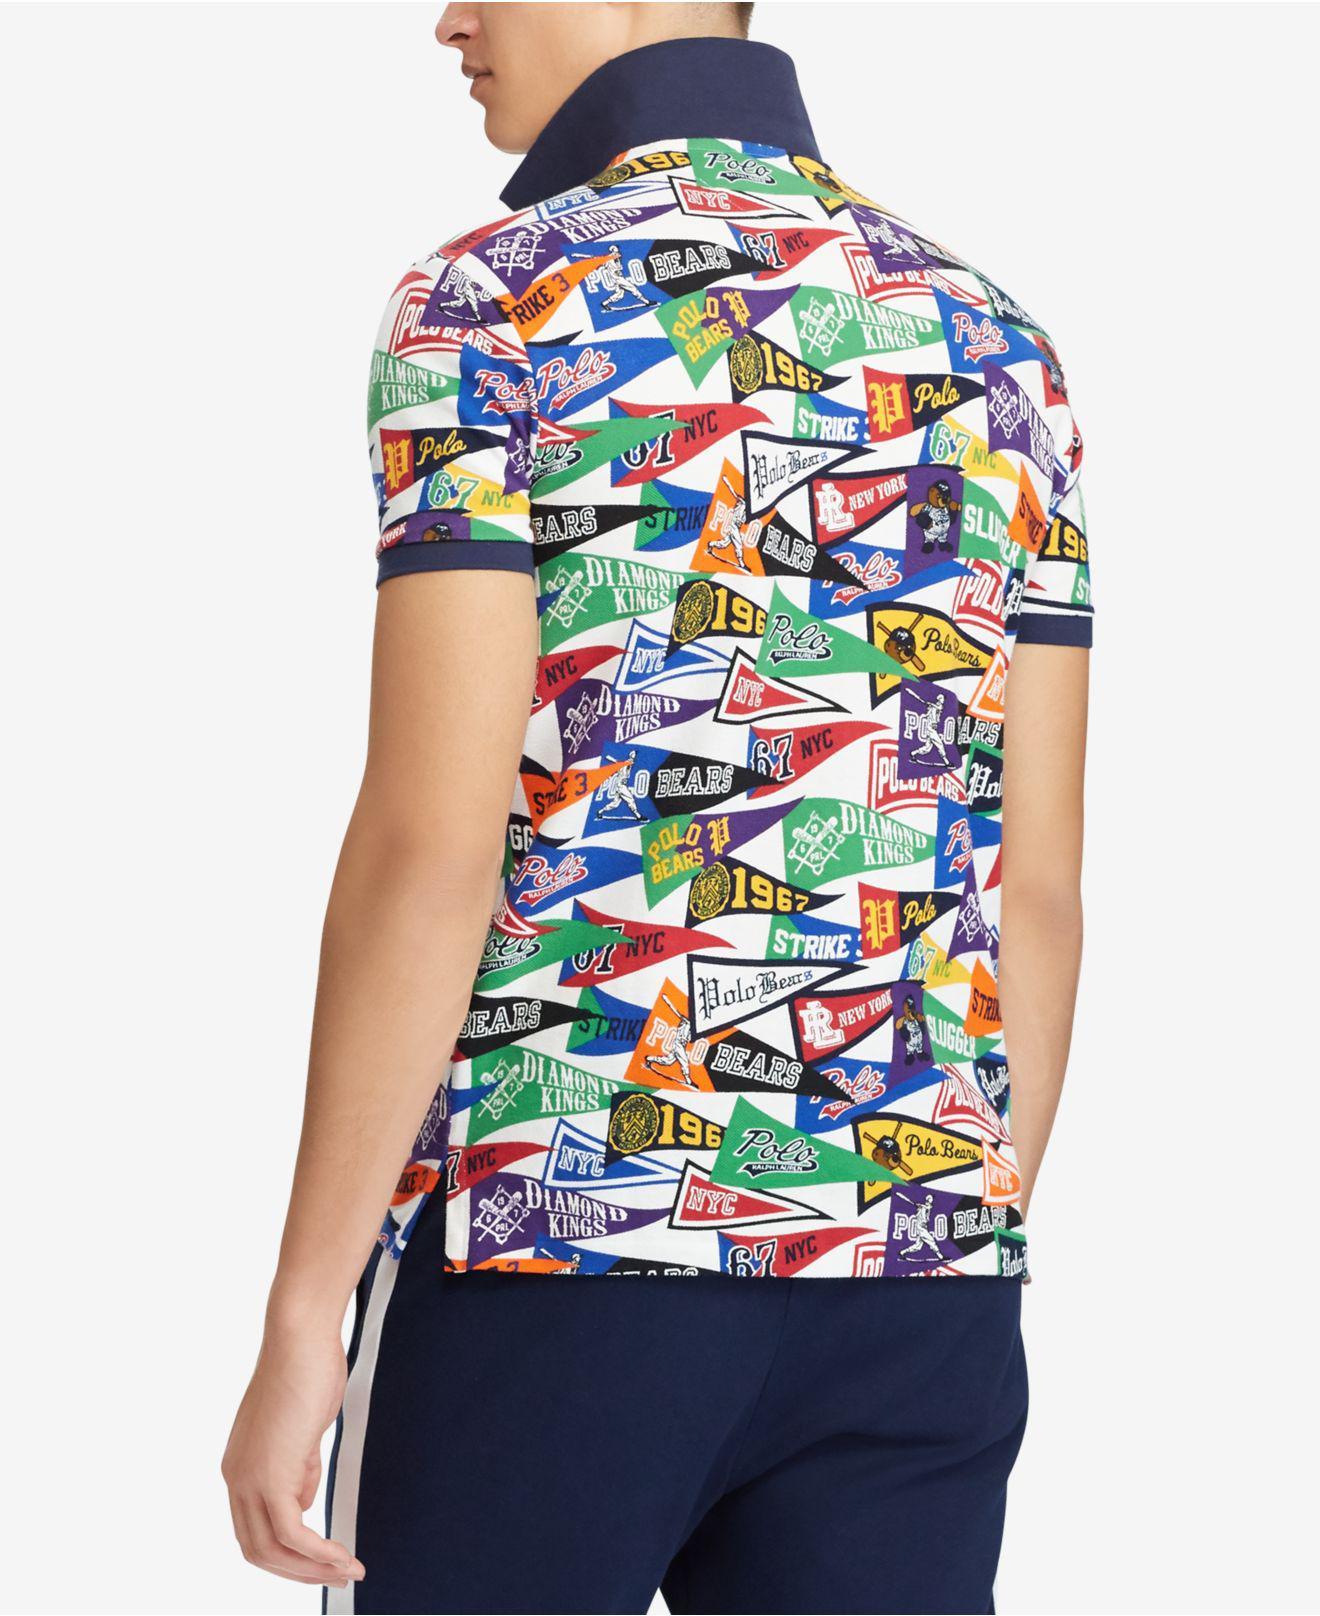 d9e39c05ab2 ... uk lyst polo ralph lauren classic fit mesh polo shirt in blue for men  5fc62 a1d7b ...